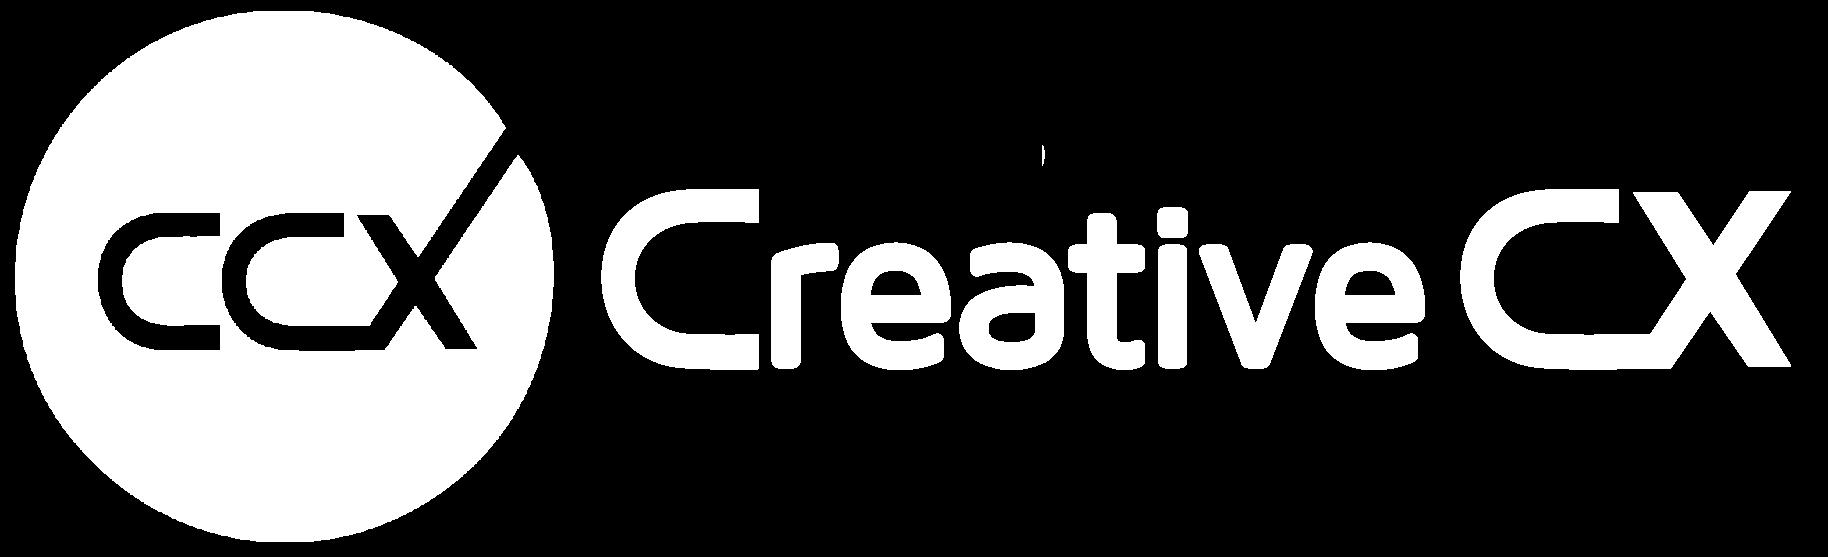 Creative CX logo